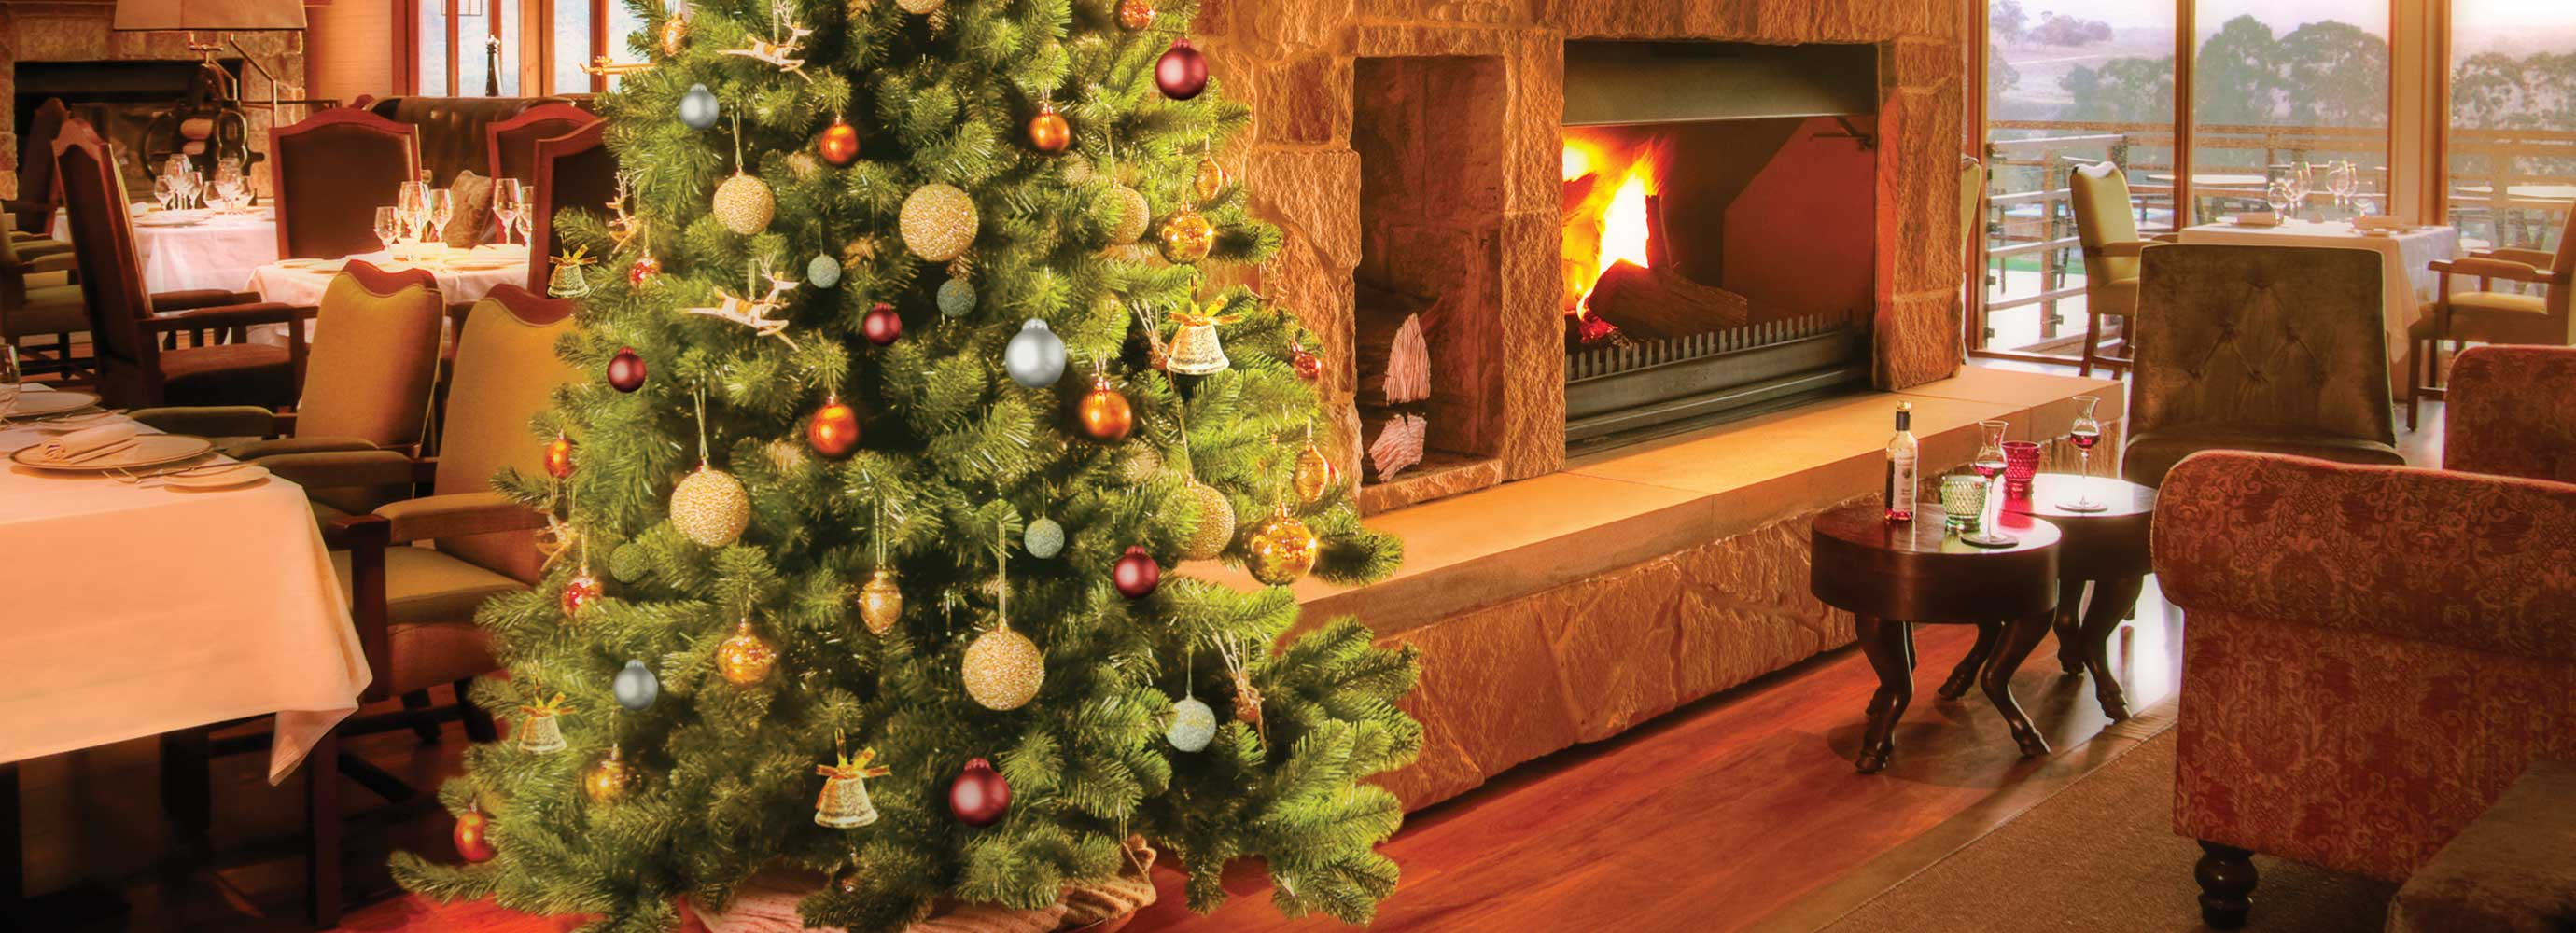 luxury lodges of australia - Christmas In July Australia